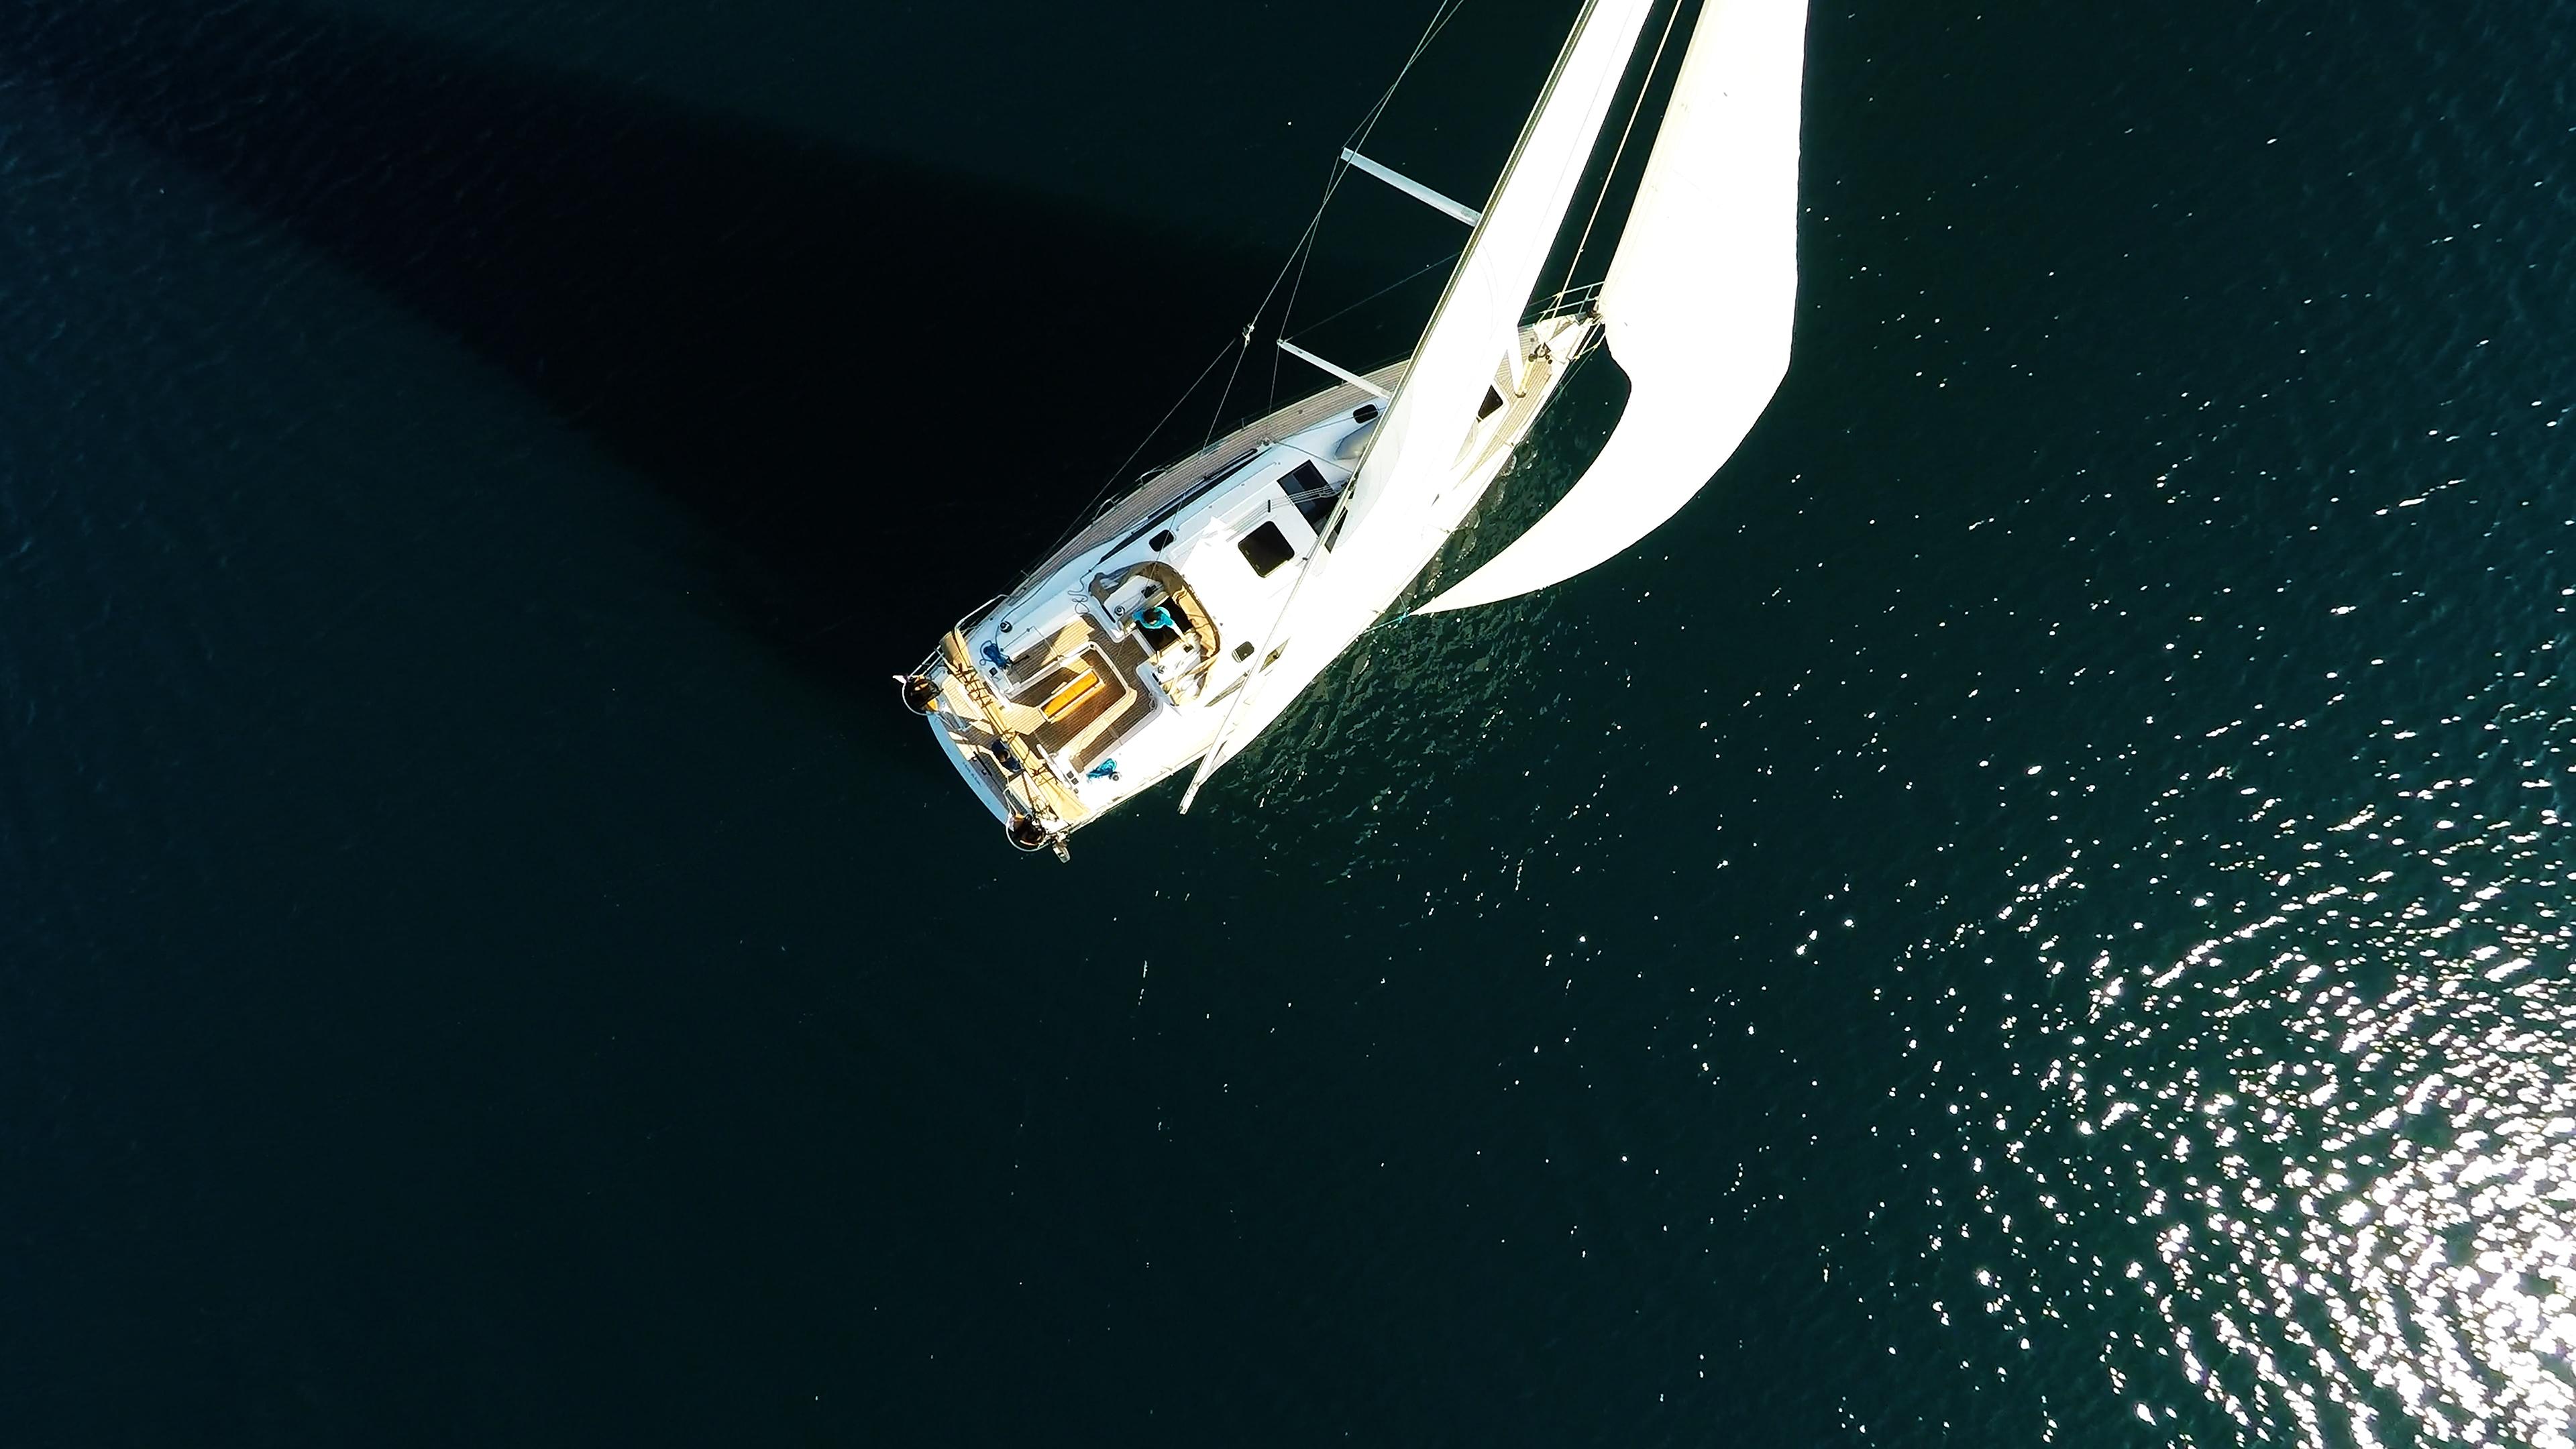 barcha a vela copertain teak per barche a vela da sopra yacht a vela elan 45 impression